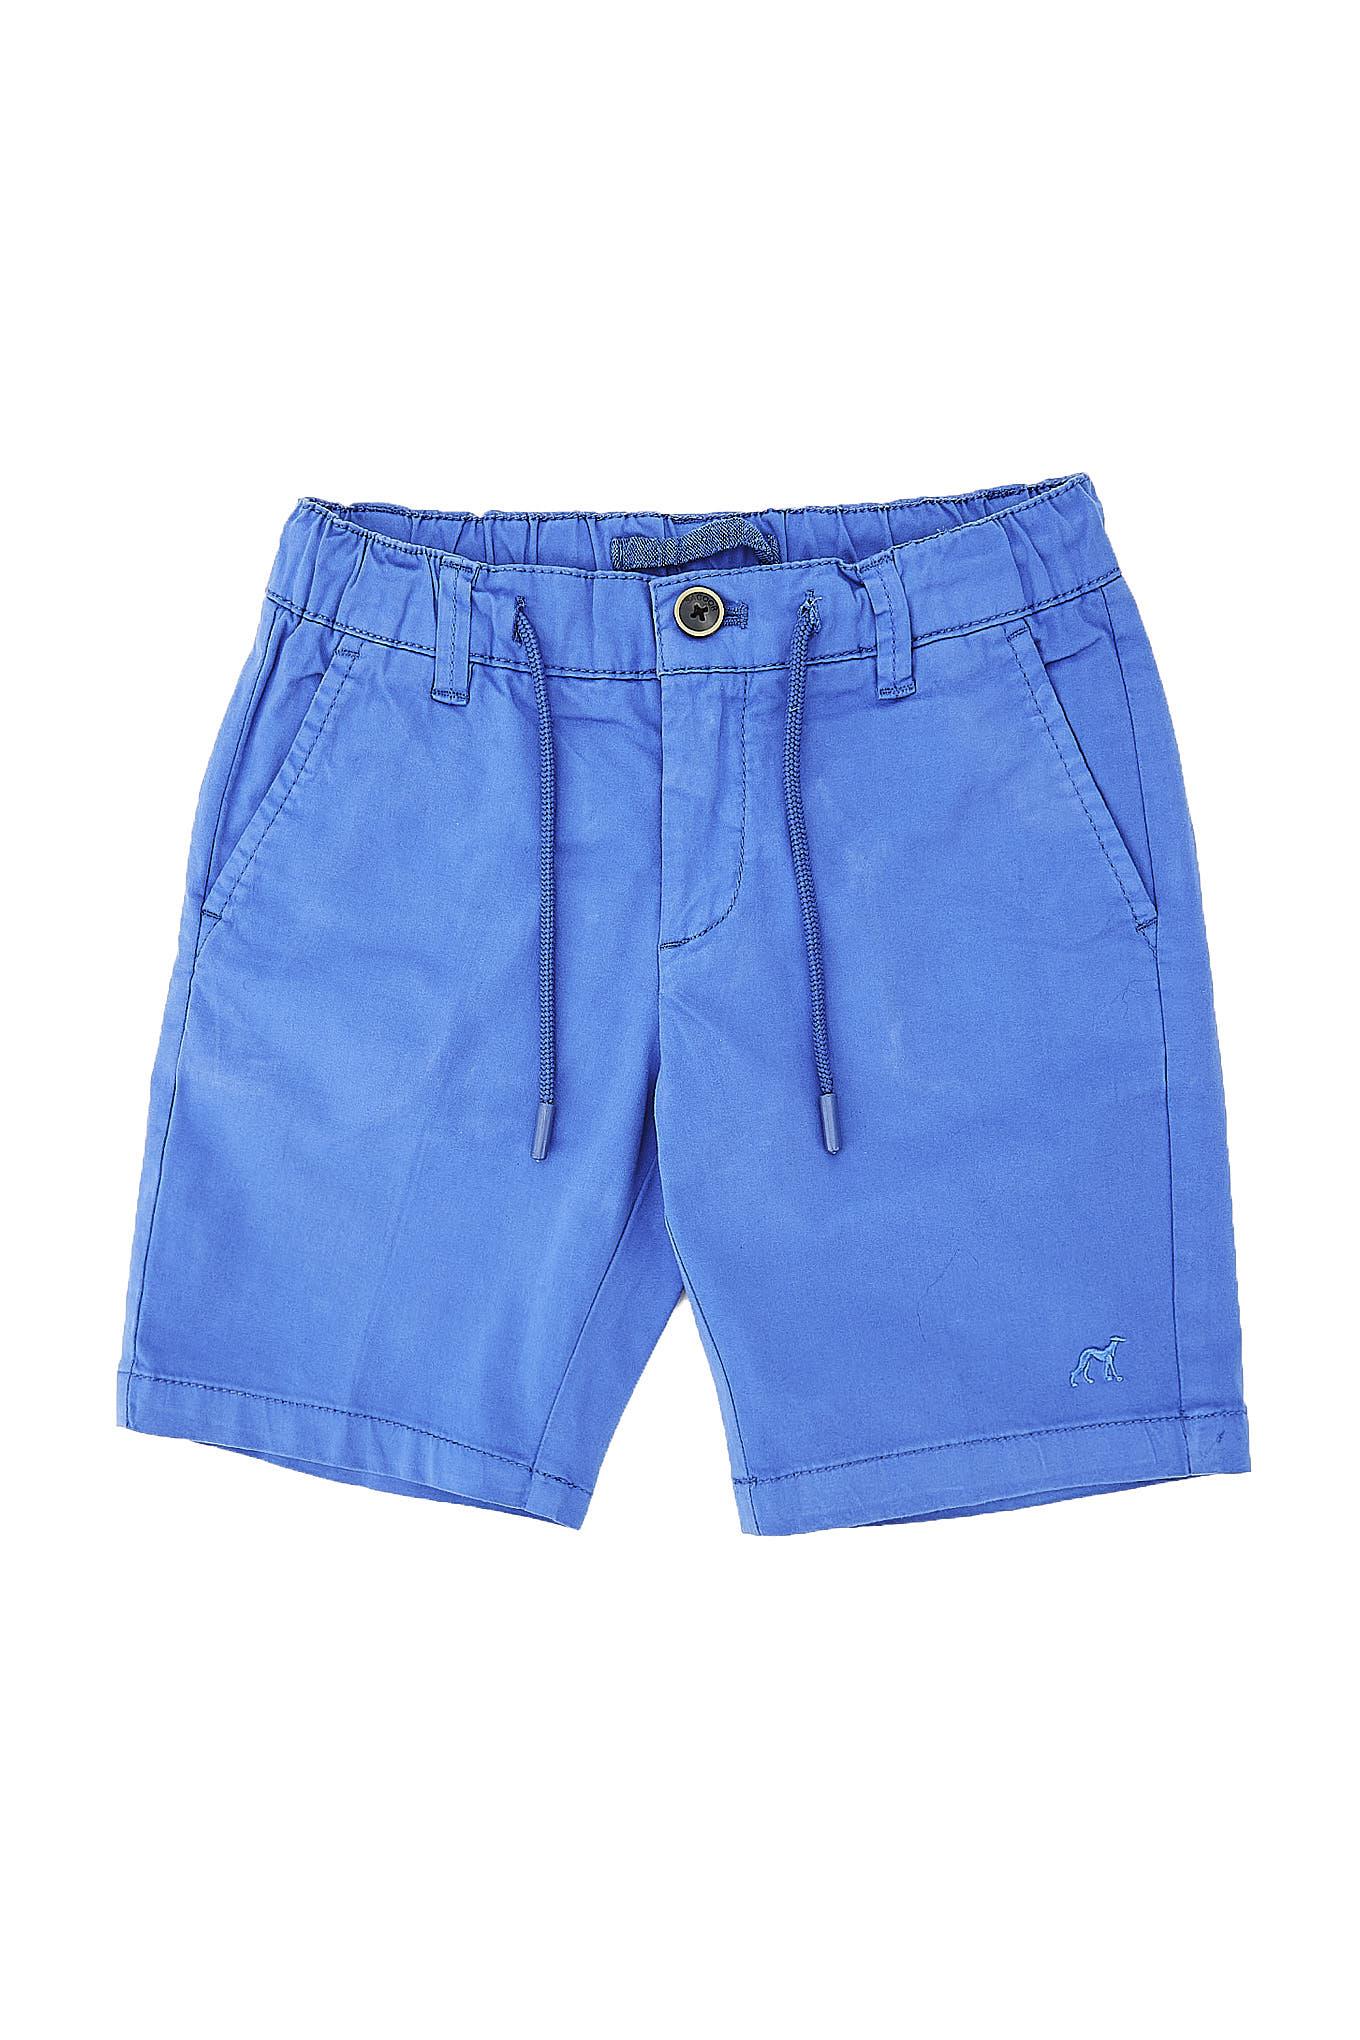 Bermuda Azul Casual Rapaz